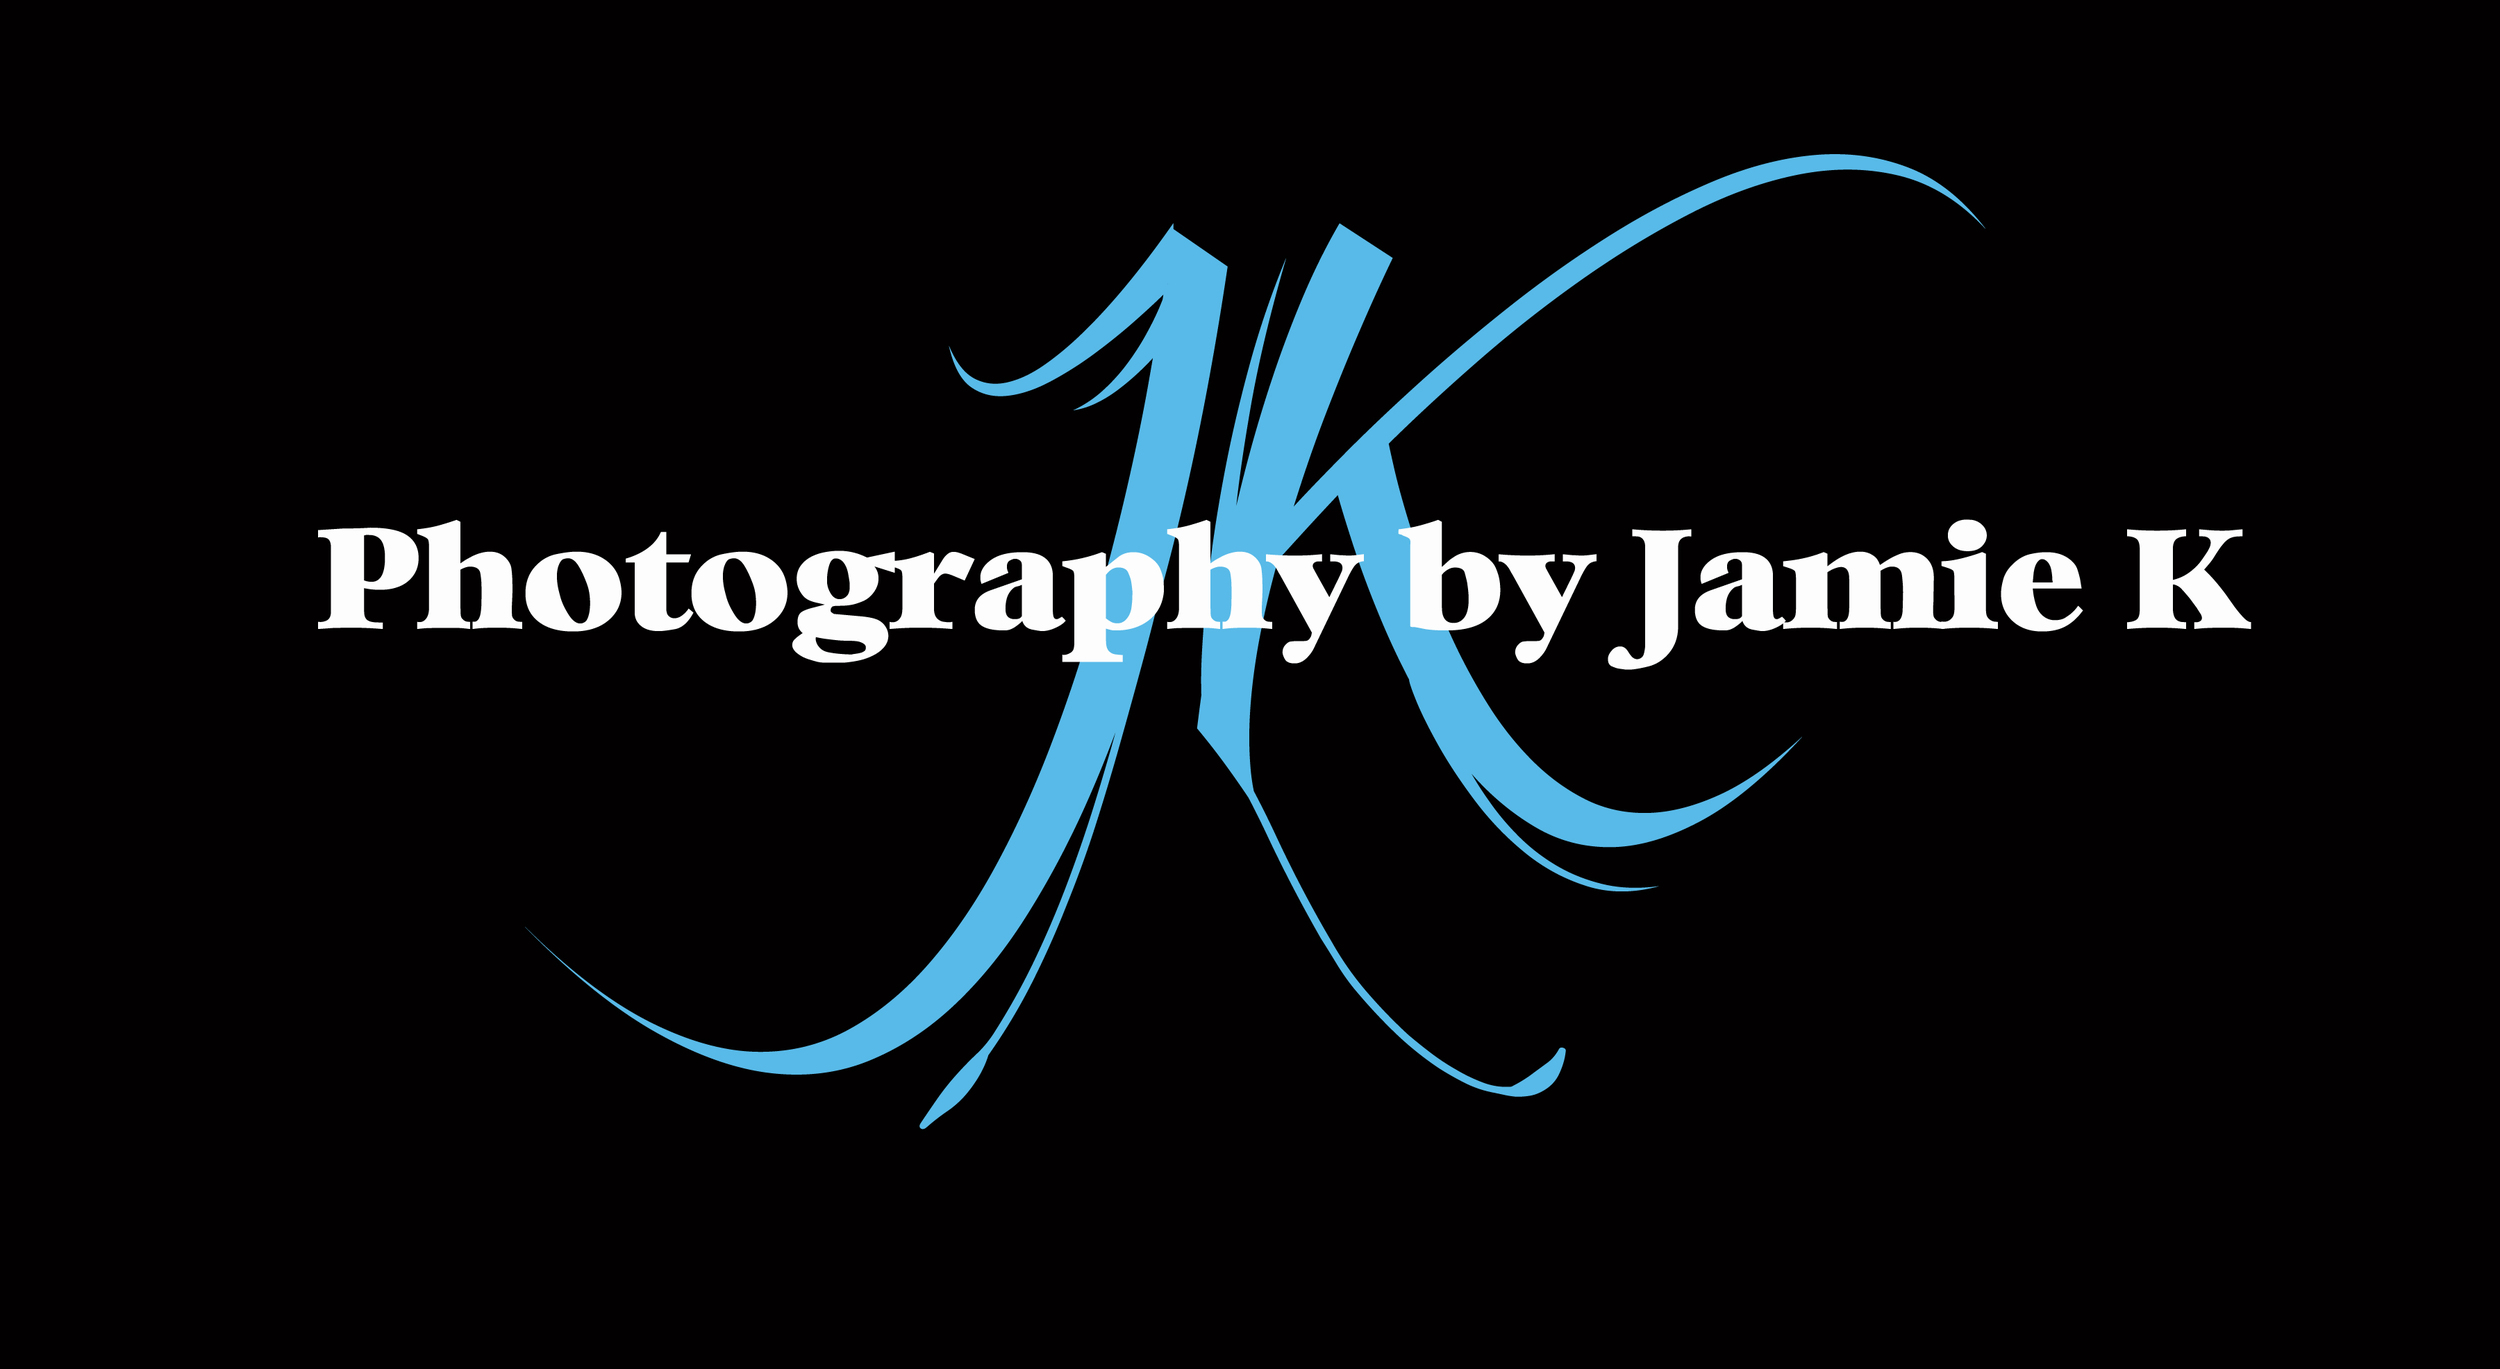 JK logo2 white copy.jpg